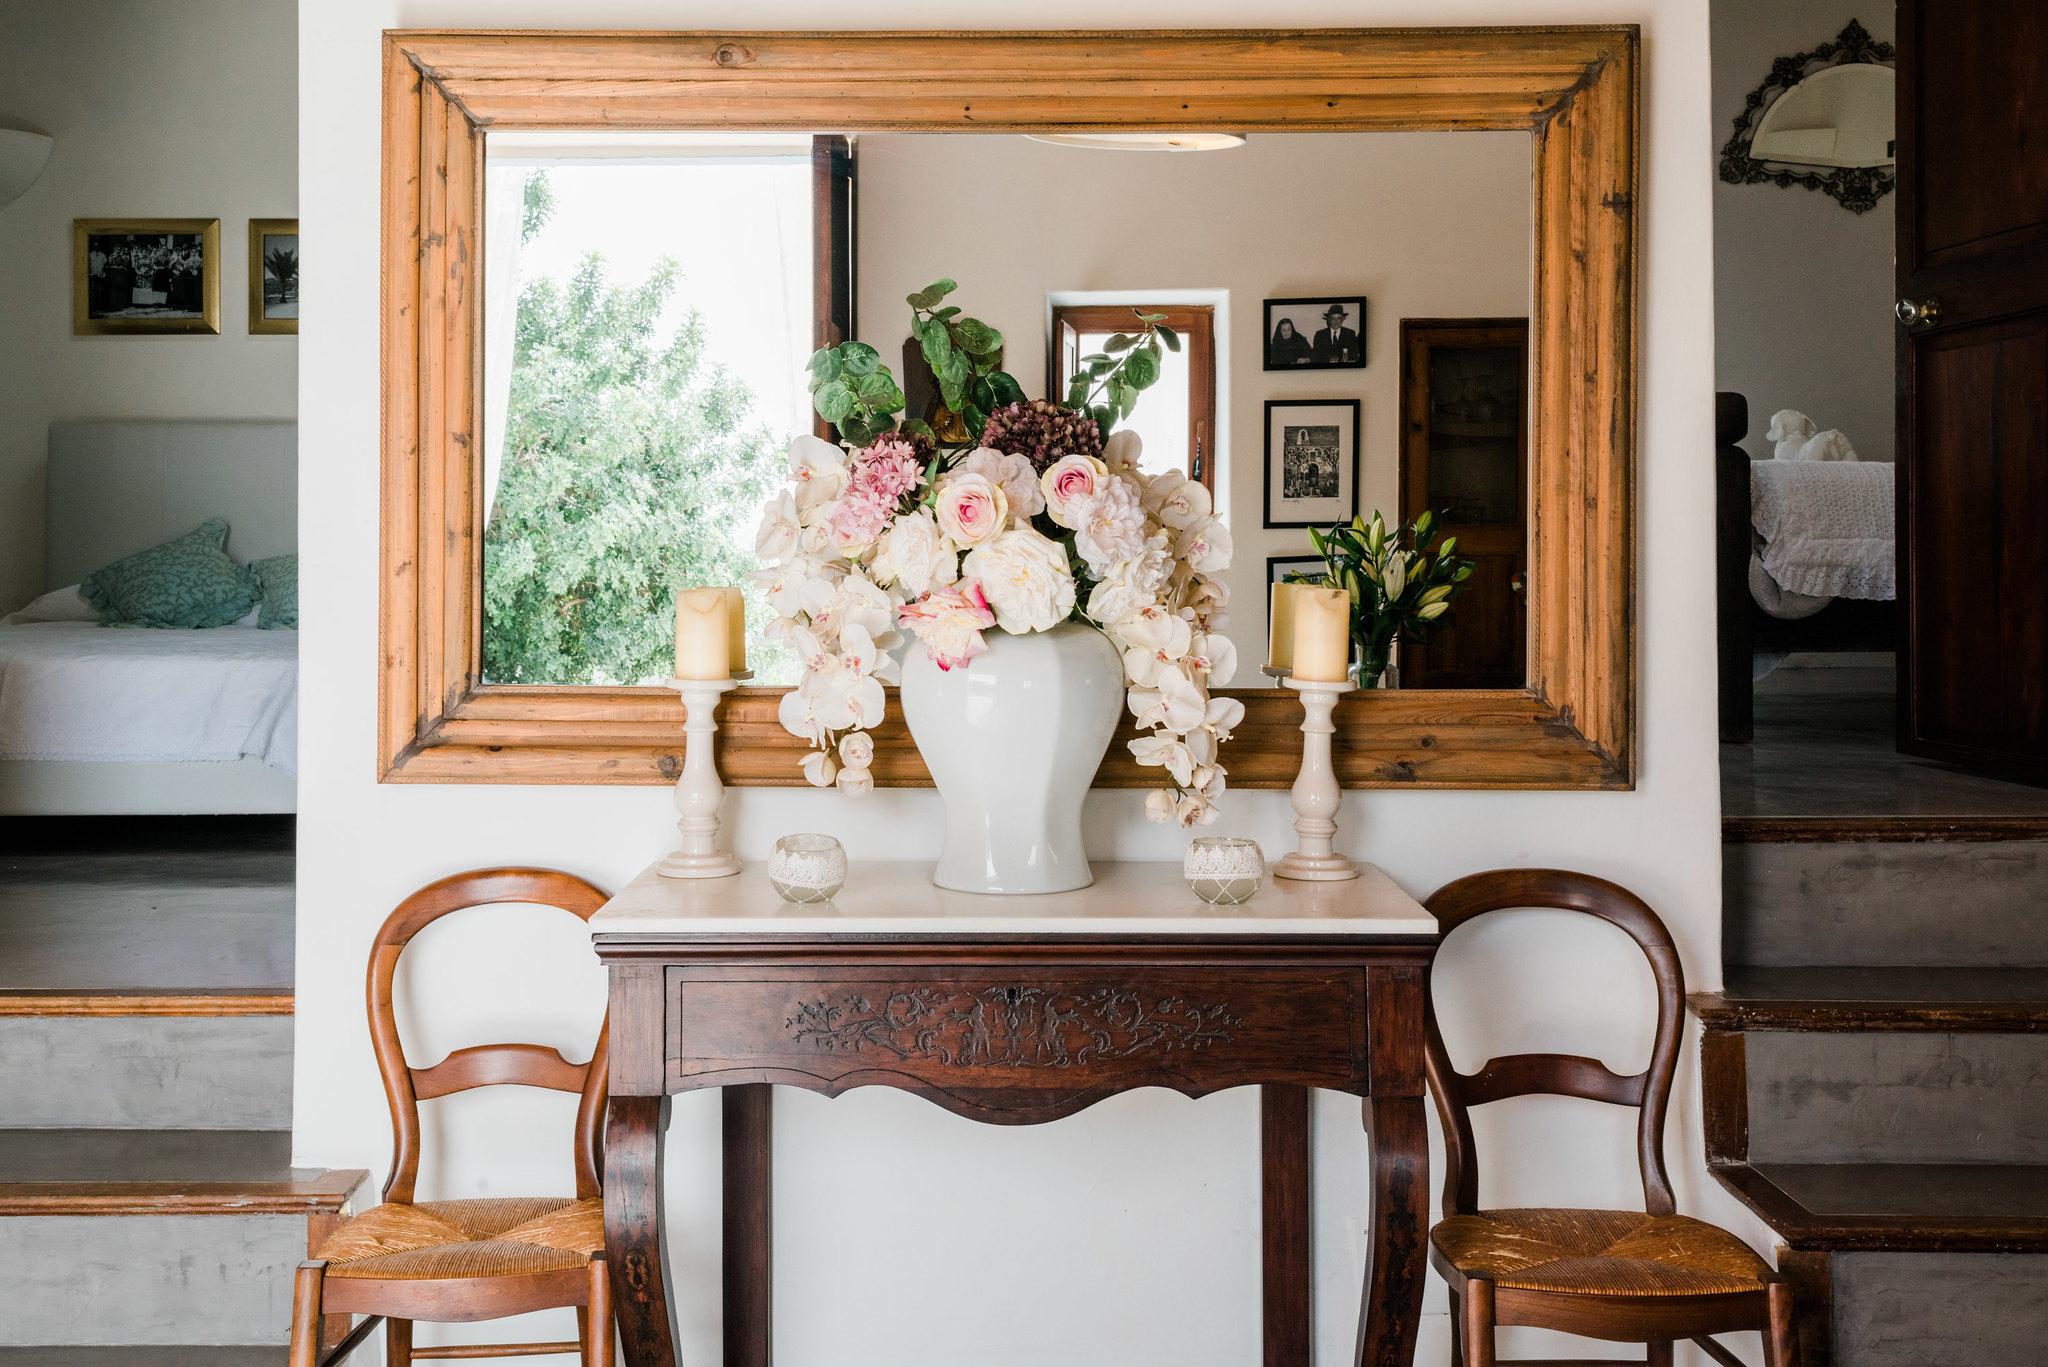 https://www.white-ibiza.com/wp-content/uploads/2020/06/white-ibiza-villas-los-corrales-interior-flowers.jpg